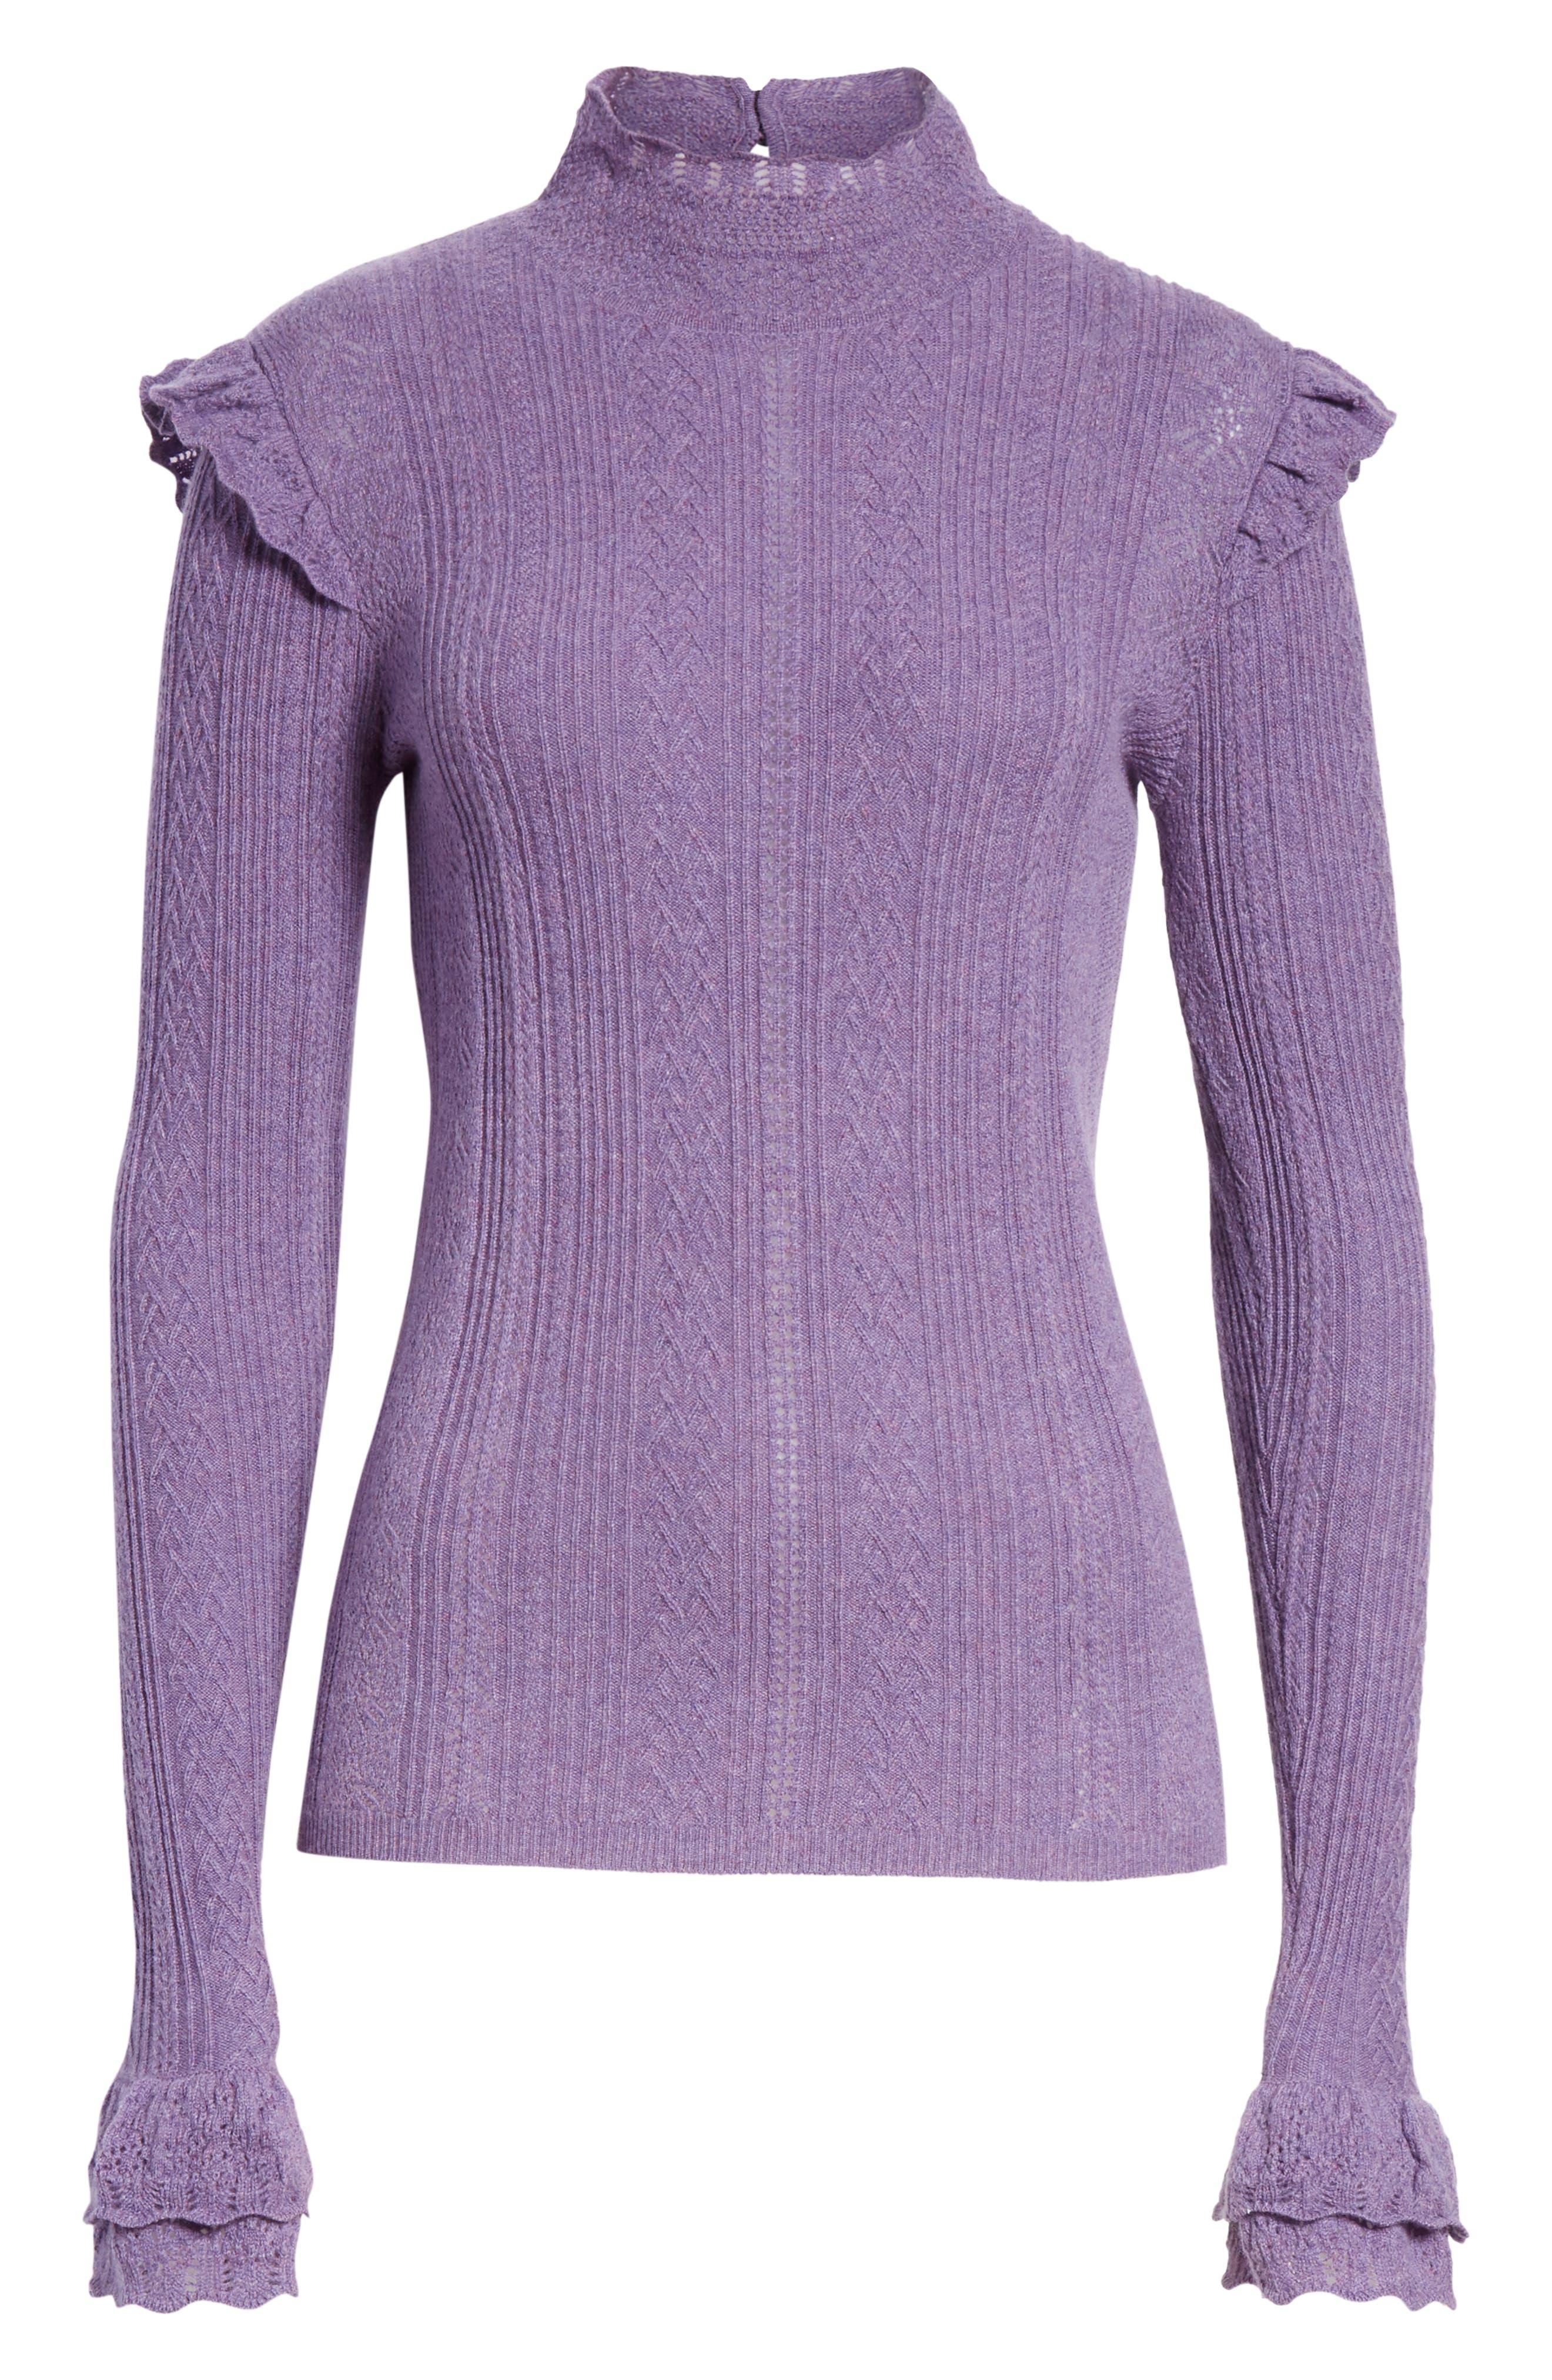 POLO RALPH LAUREN,                             Ruffle Detail Pointelle Sweater,                             Alternate thumbnail 6, color,                             500